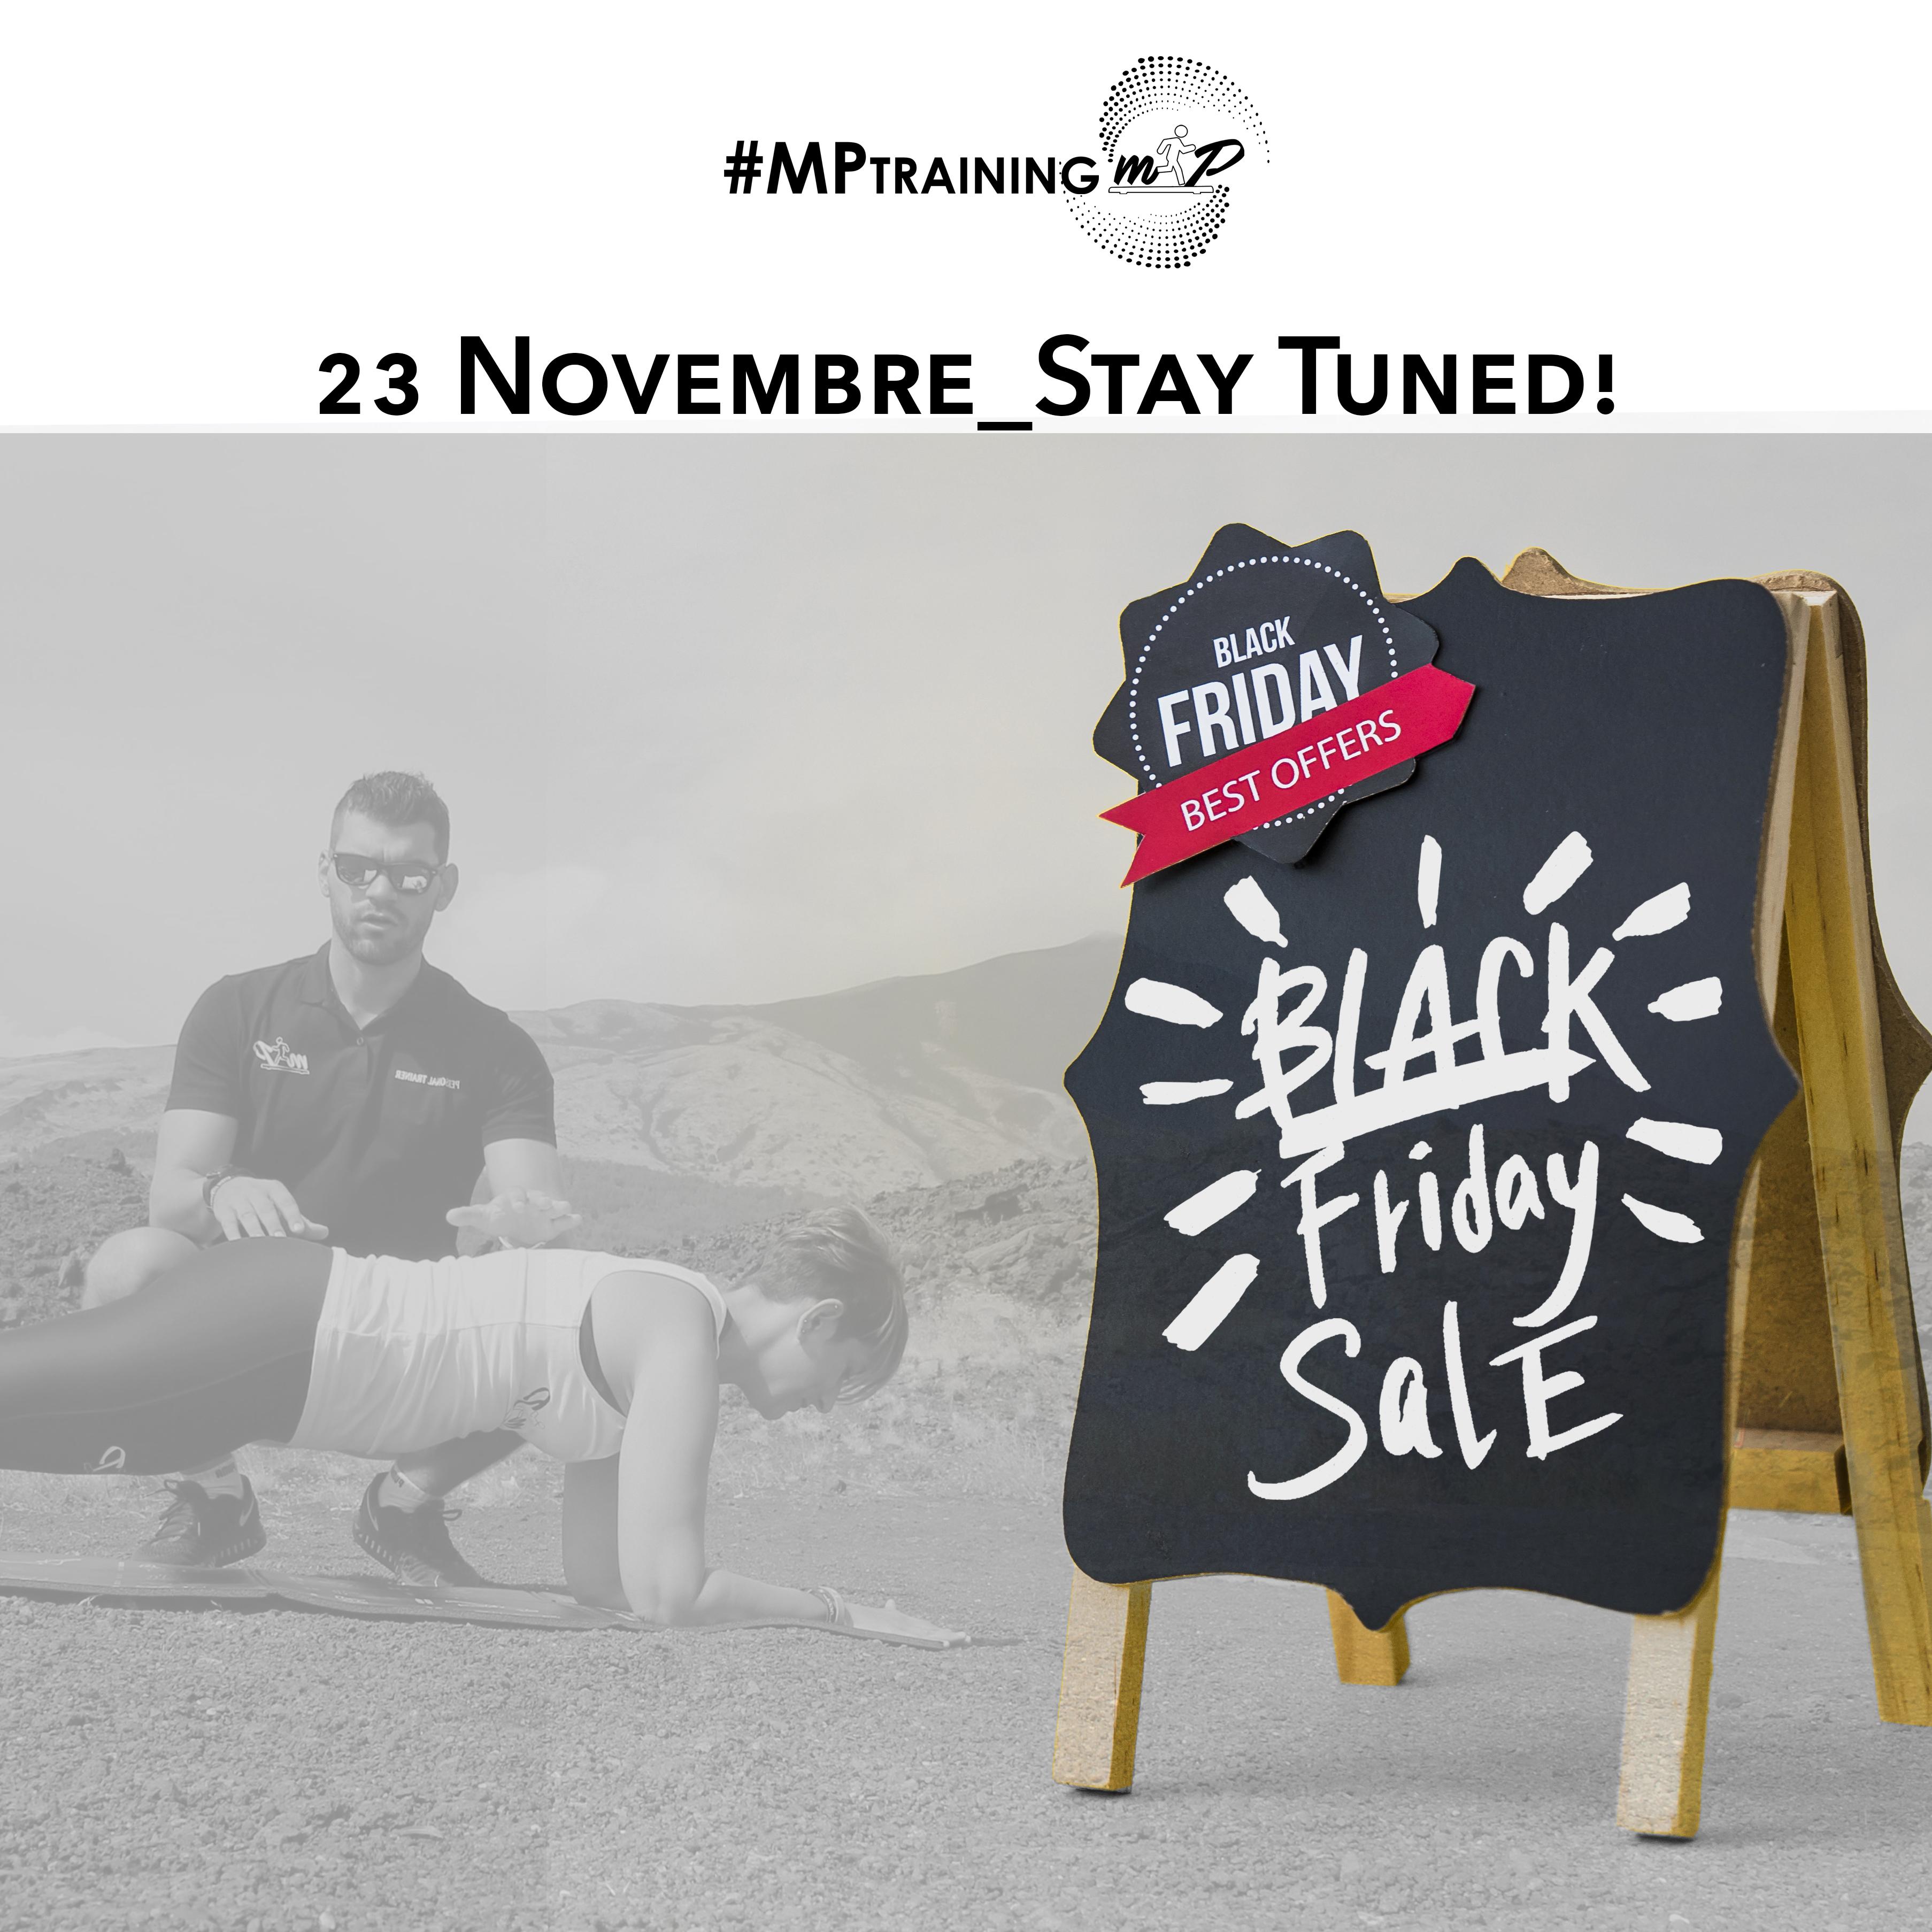 MP-BLACK Week FIT-你的正確機會!!